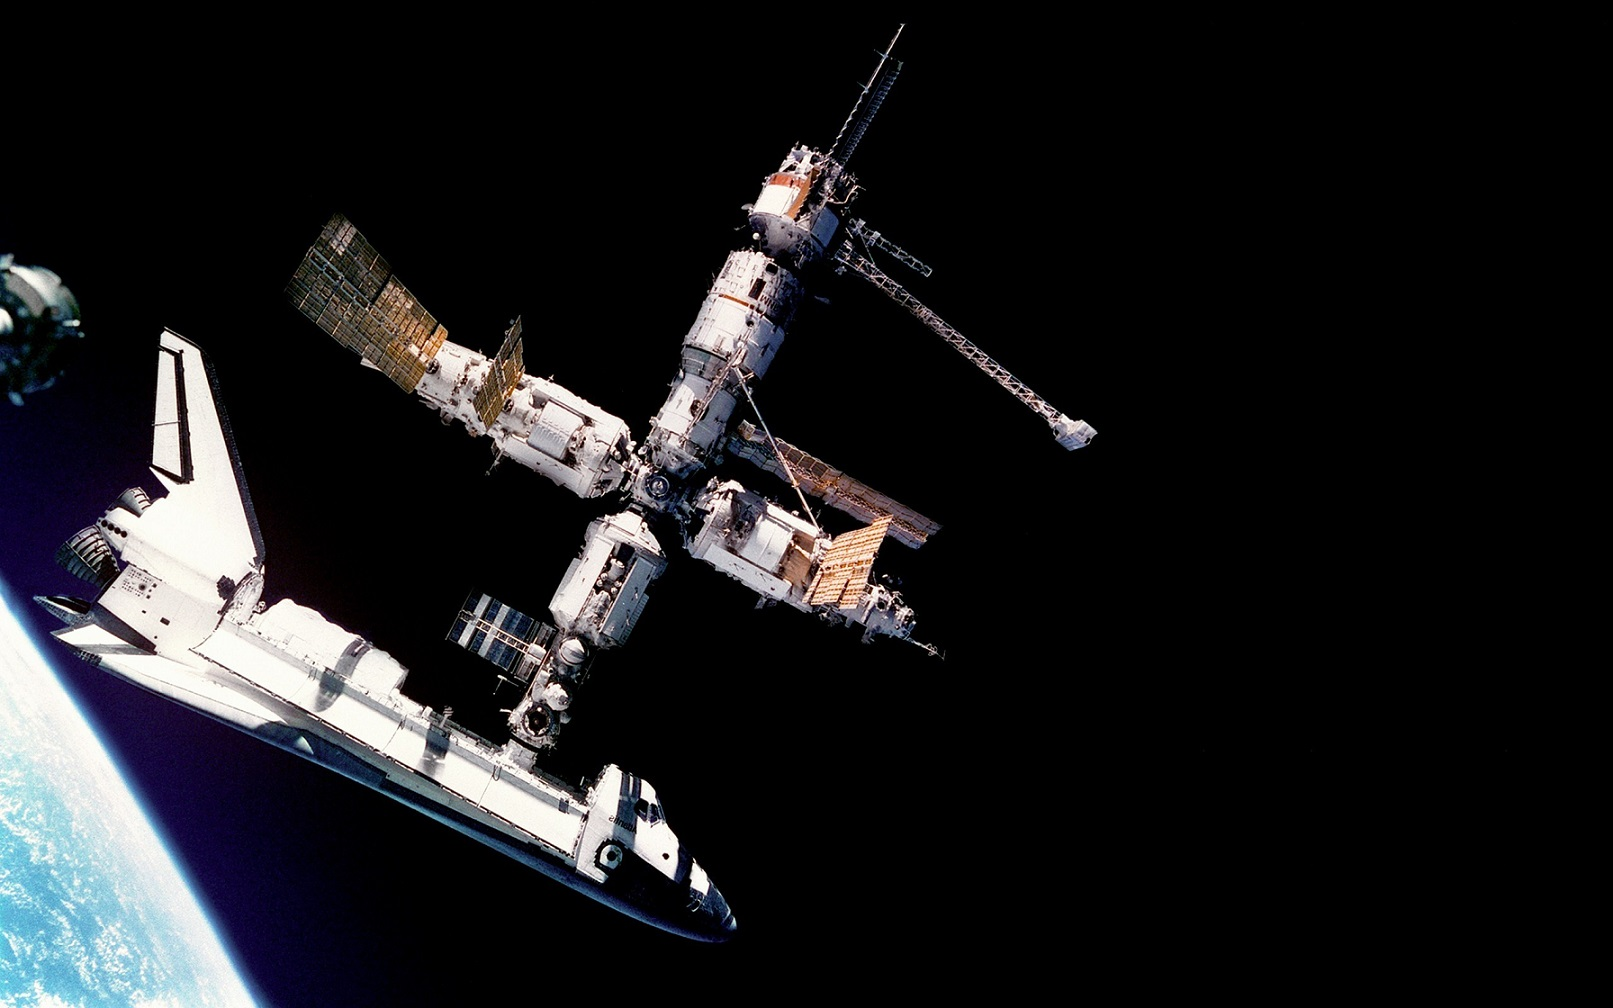 2850089-space-shuttle-space-mir___cosmos-space-wallpapers.jpg